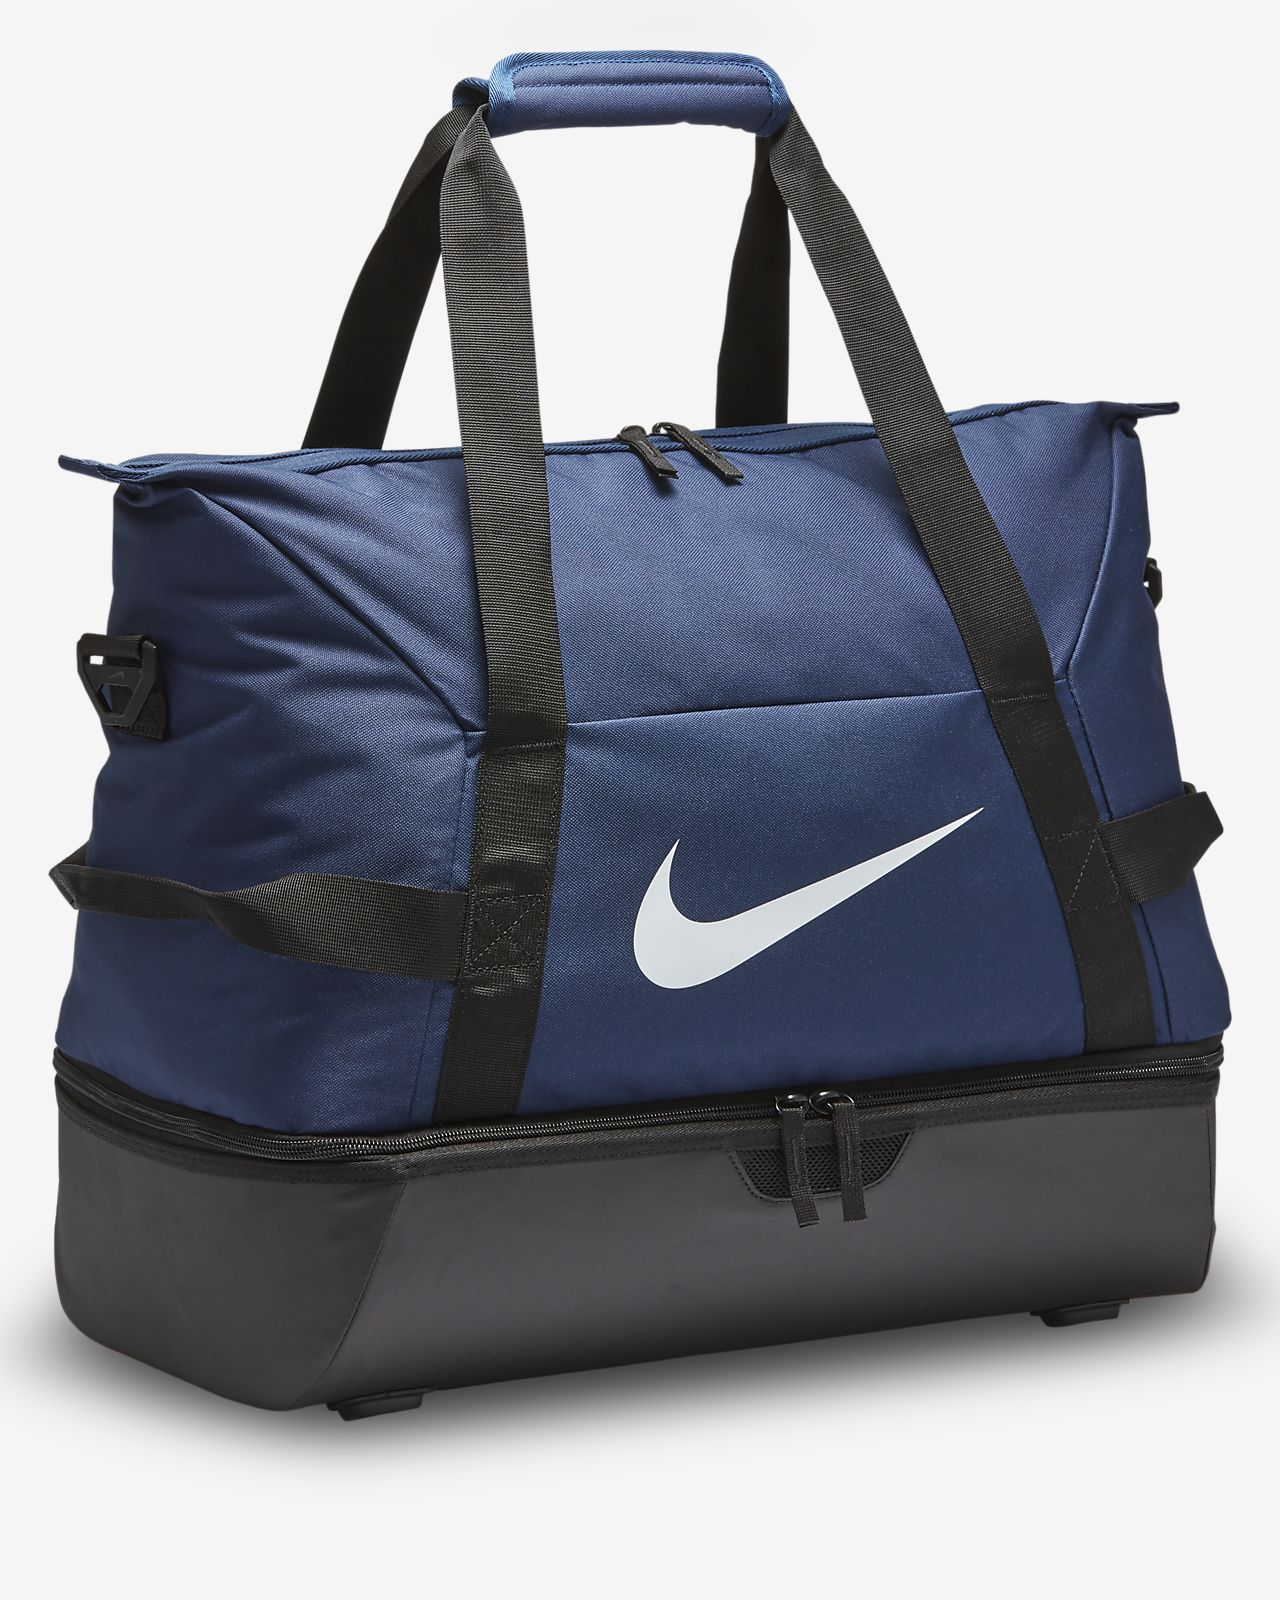 Nike Academy Team Football Hard Case Bag (Medium)